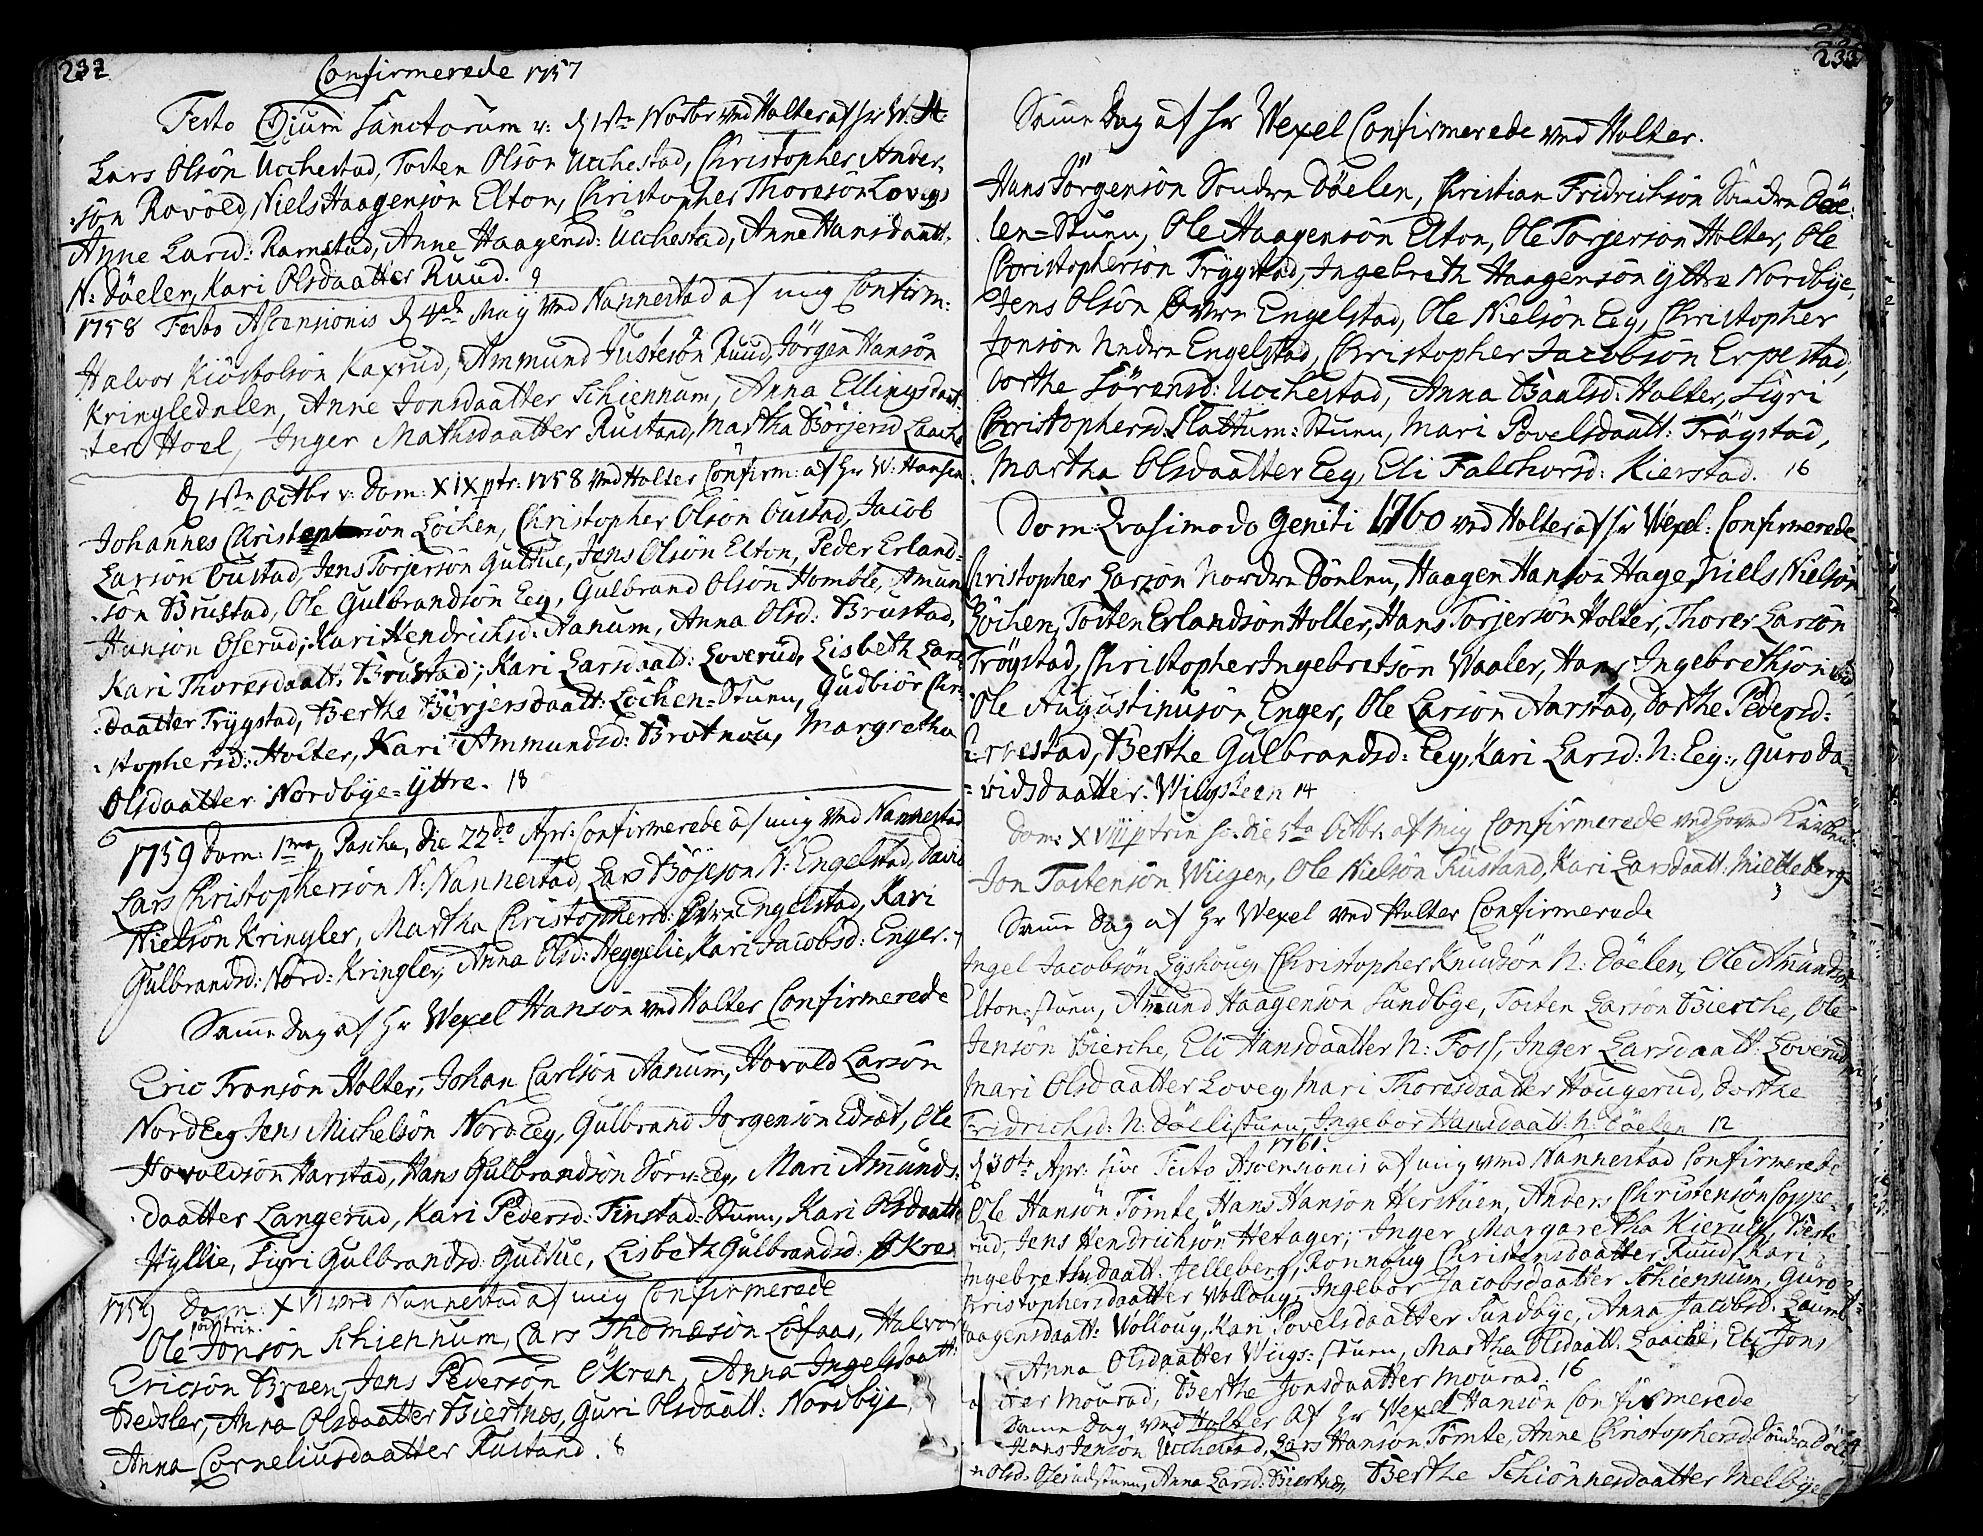 SAO, Nannestad prestekontor Kirkebøker, F/Fa/L0007: Ministerialbok nr. I 7, 1754-1791, s. 232-233